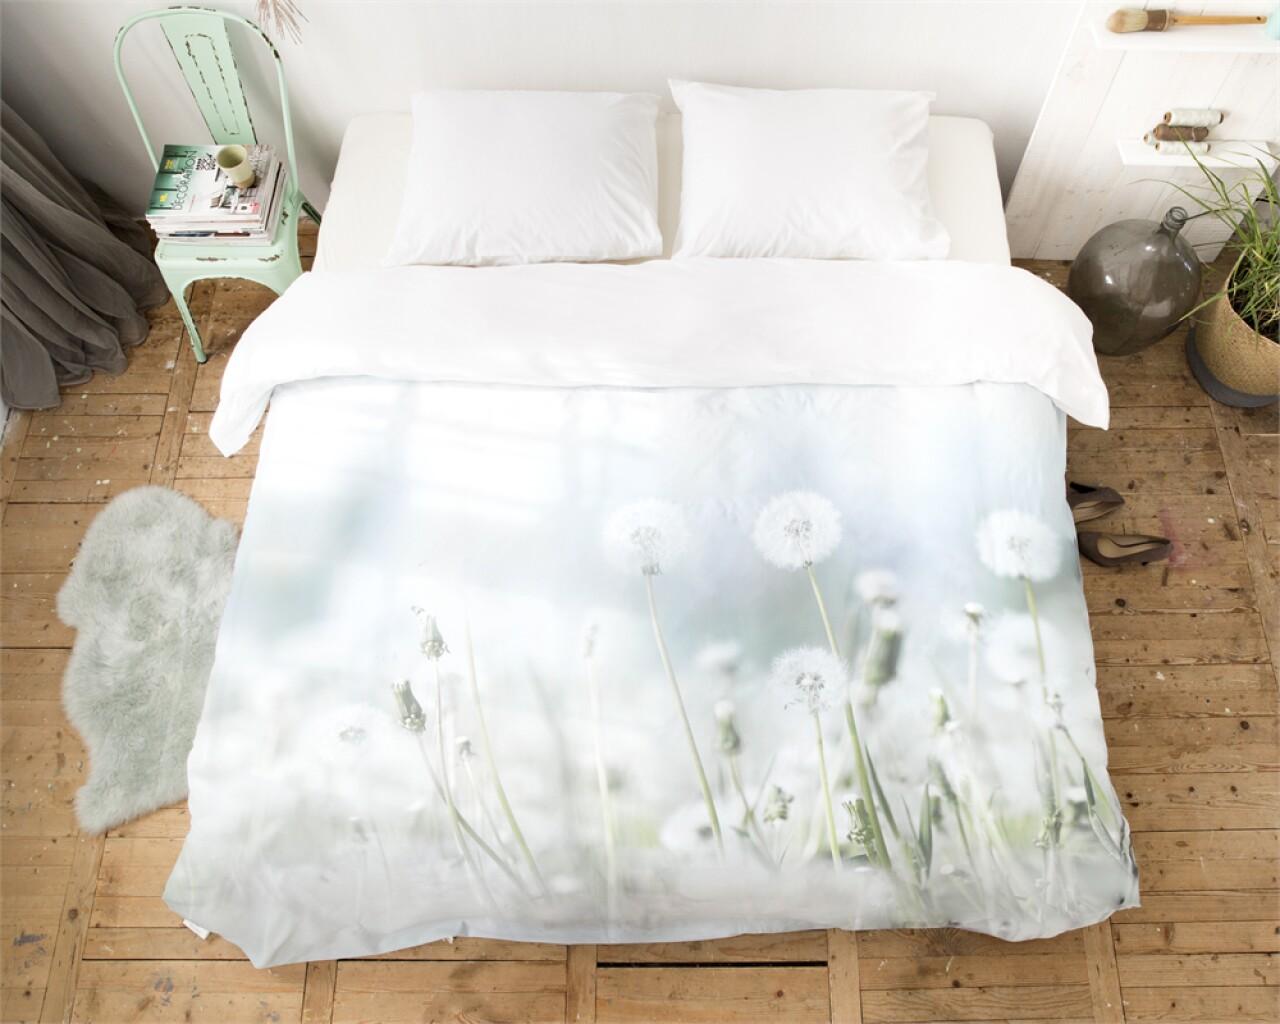 Lenjerie de pat pentru doua persoane Summer Morning Meadow Green, Royal Textile, 100% bumbac organic